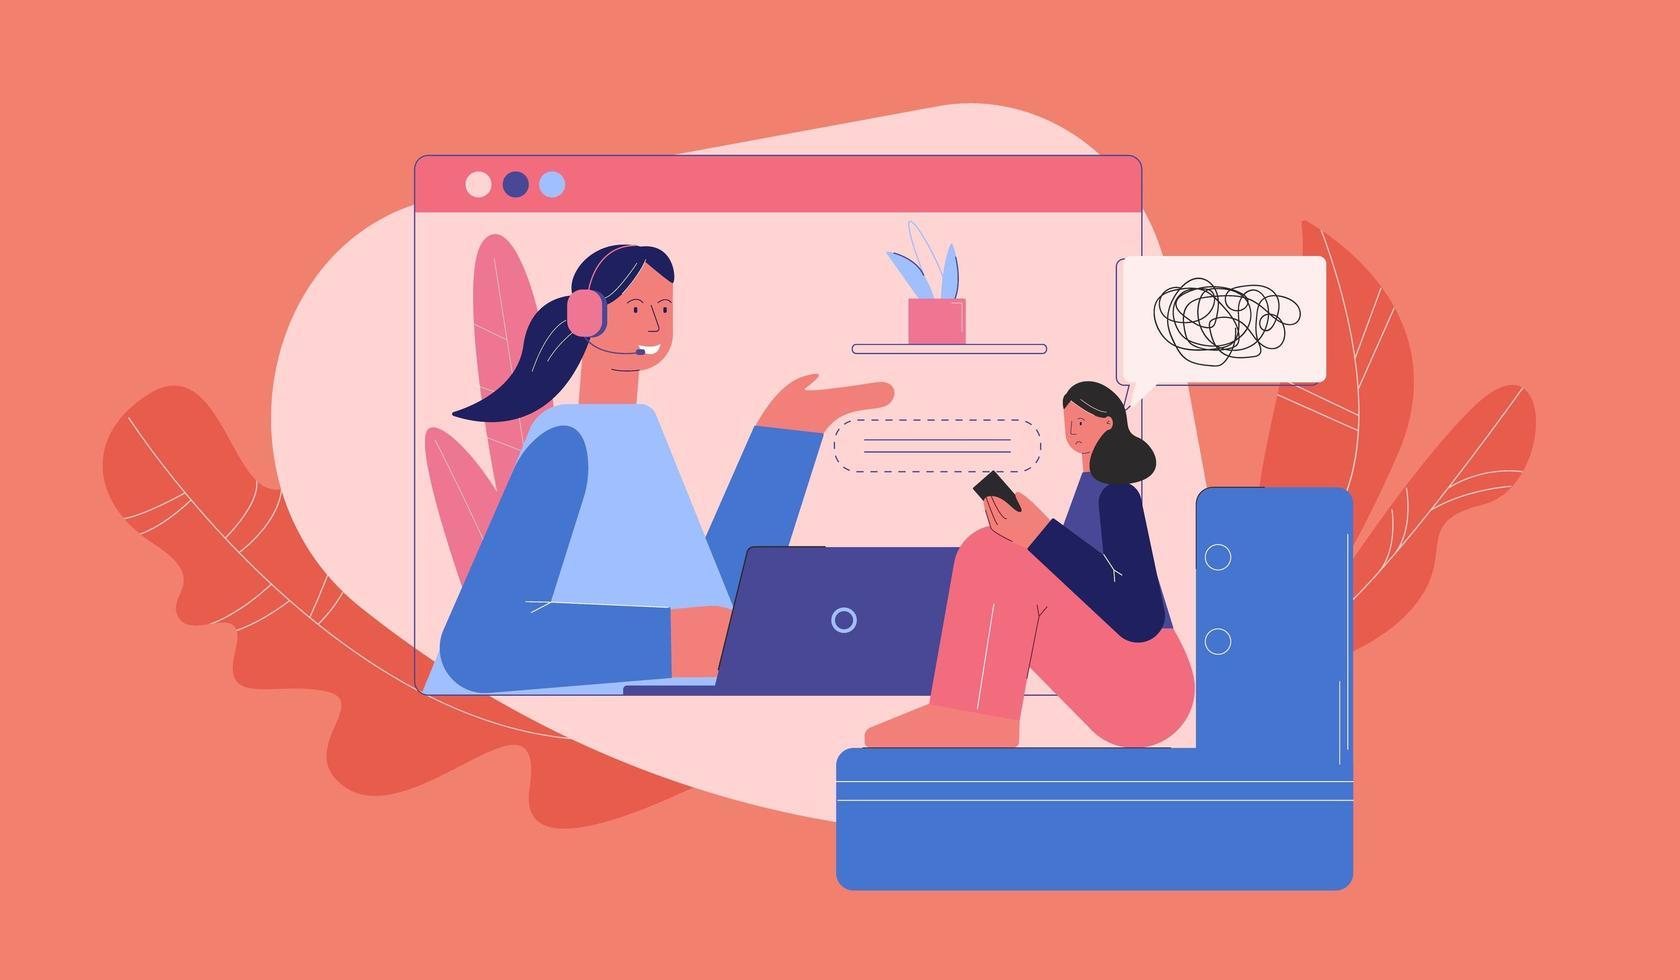 verärgerte Frau bei der Beratung mit Psychologe online vektor